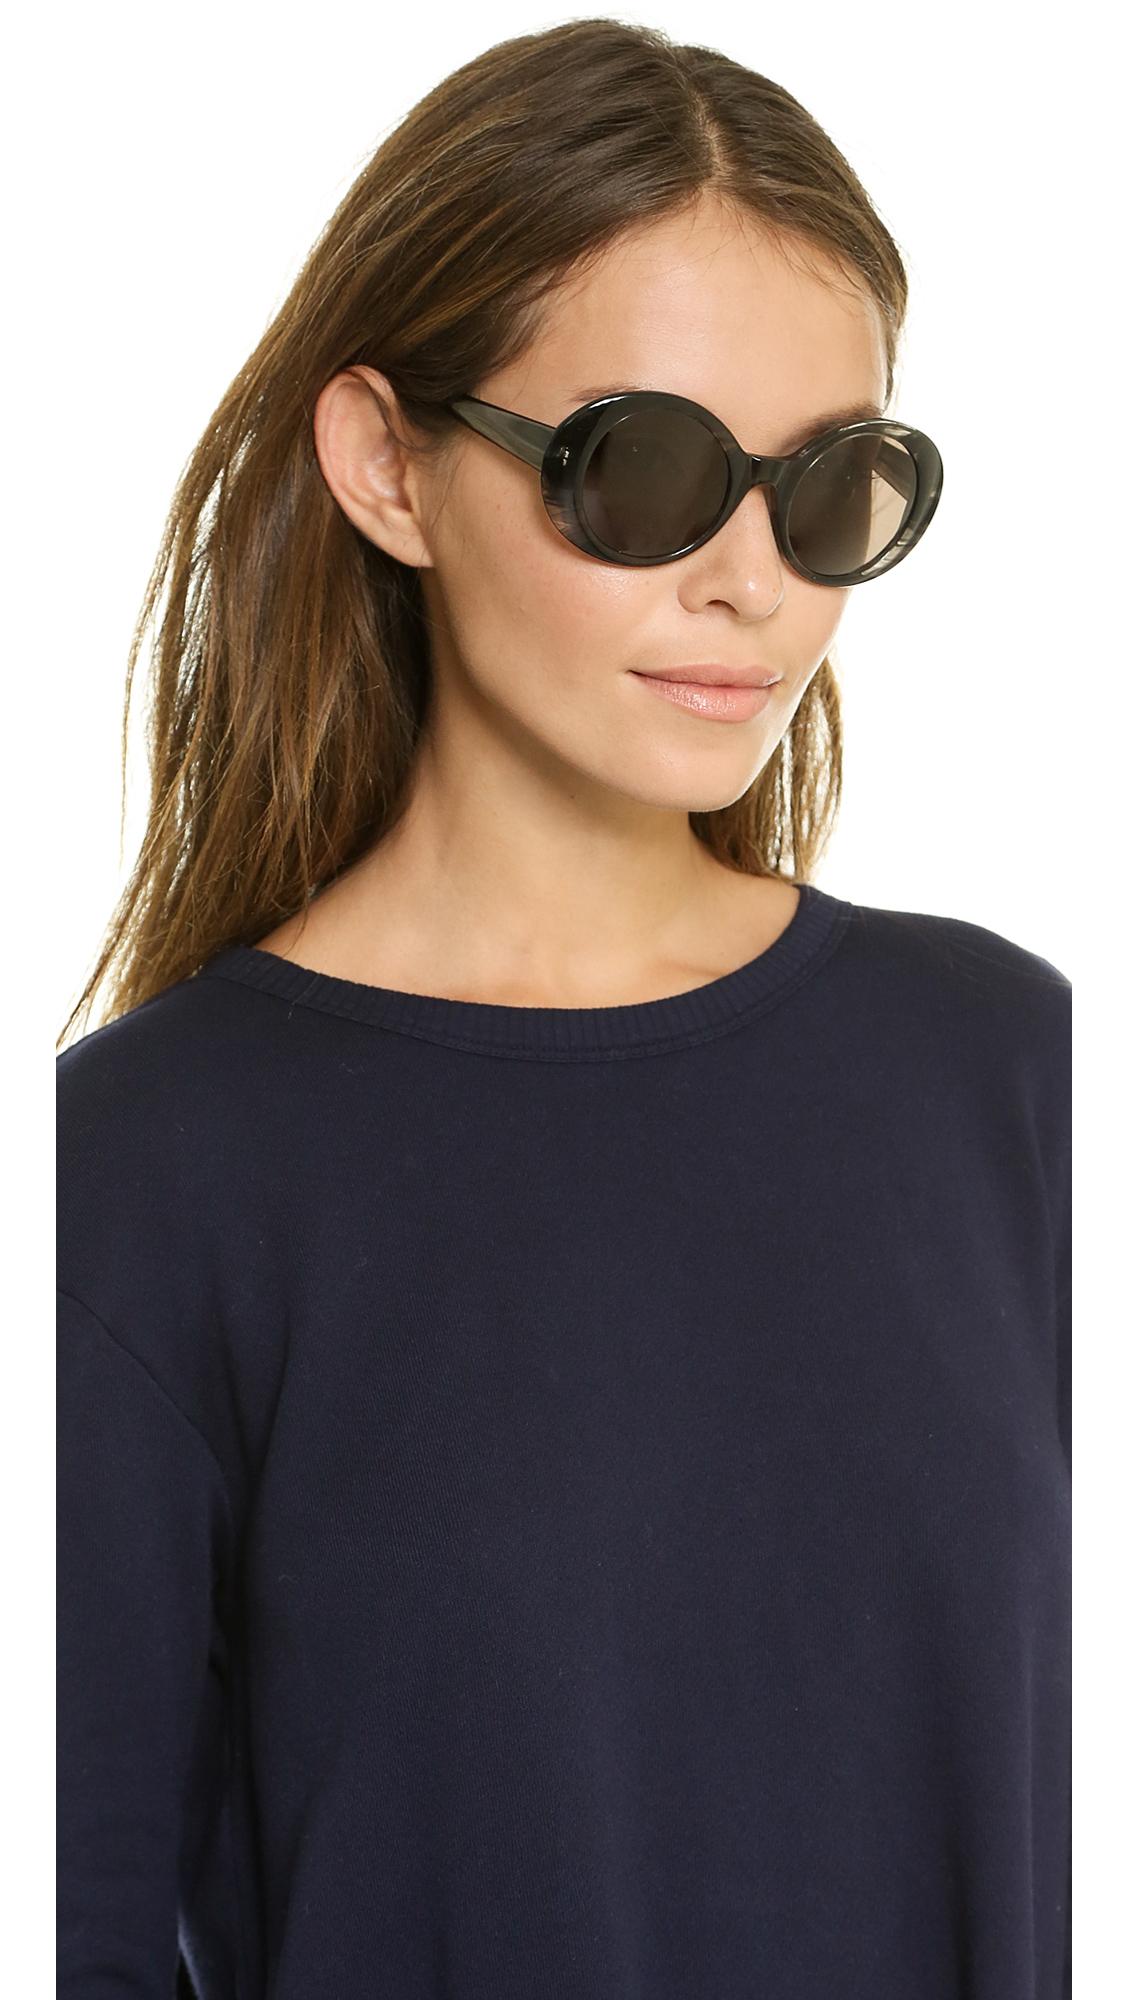 lyst elizabeth and james boylston polarized sunglasses black smoke brown mono in black. Black Bedroom Furniture Sets. Home Design Ideas